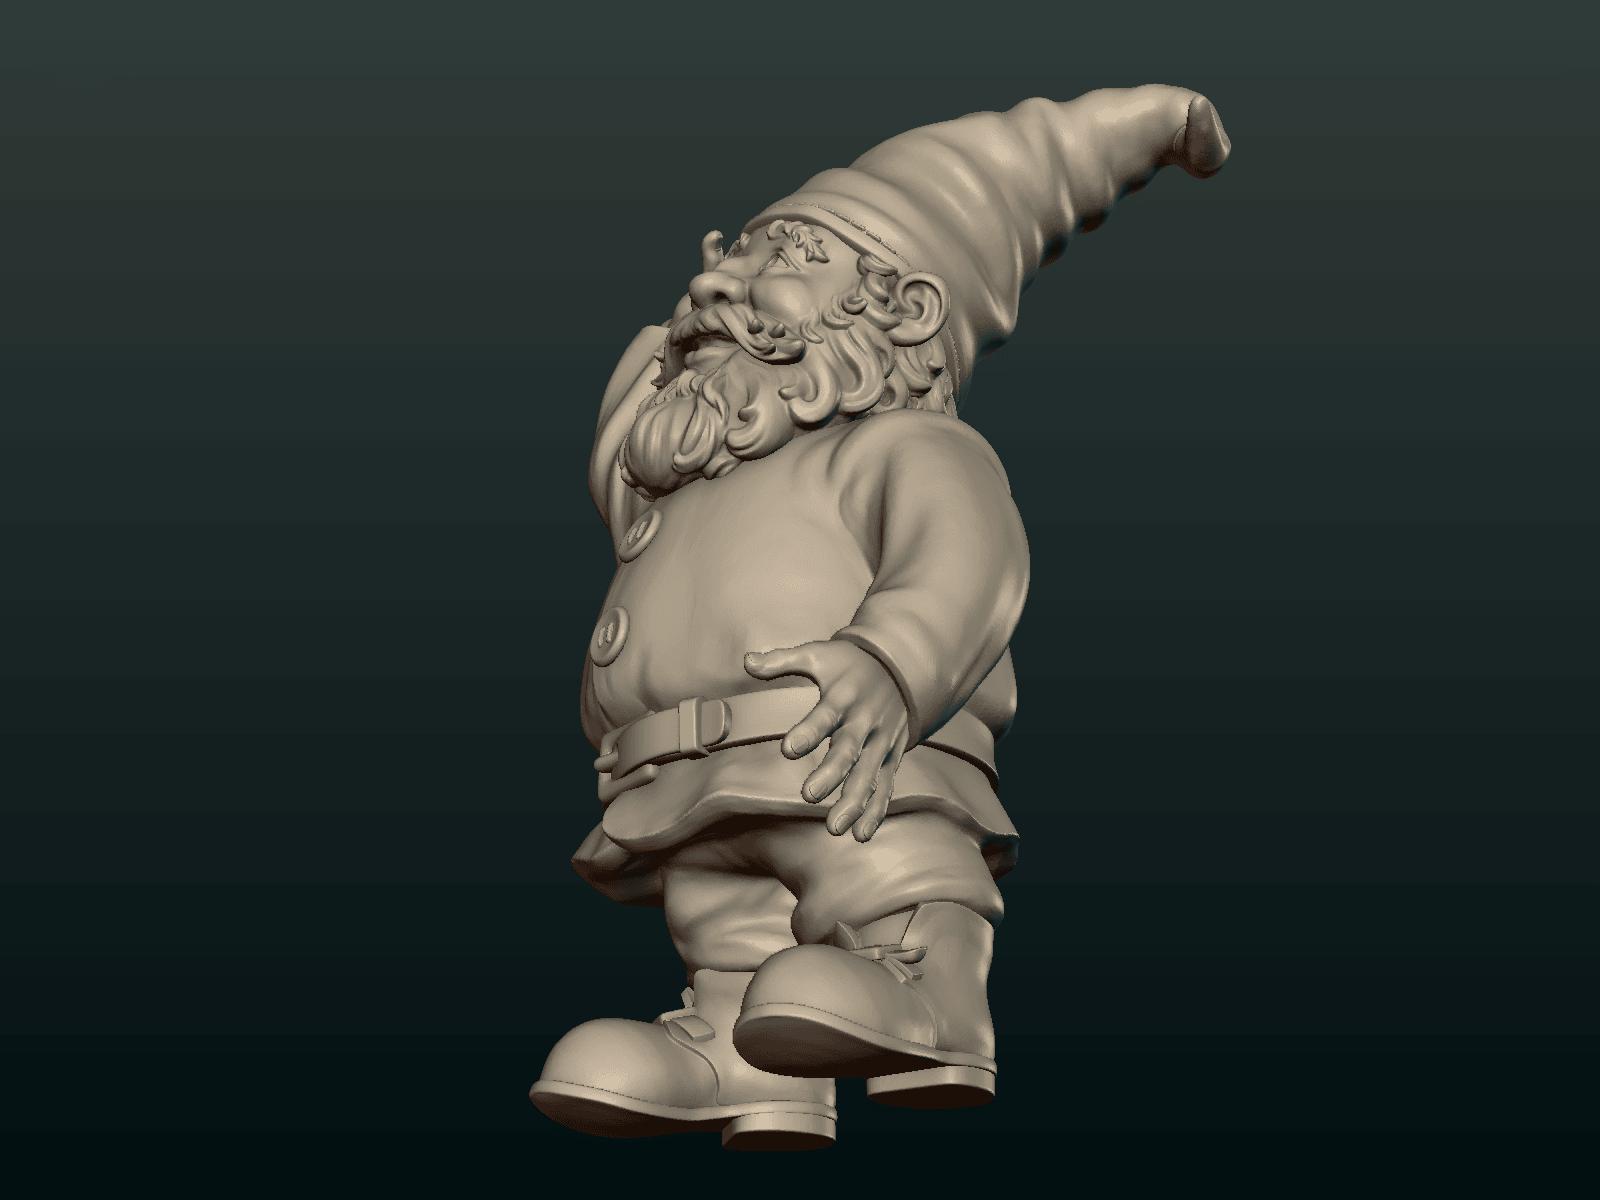 Garden_Gnome-20.png Download STL file Garden Gnome • 3D printing design, Skazok